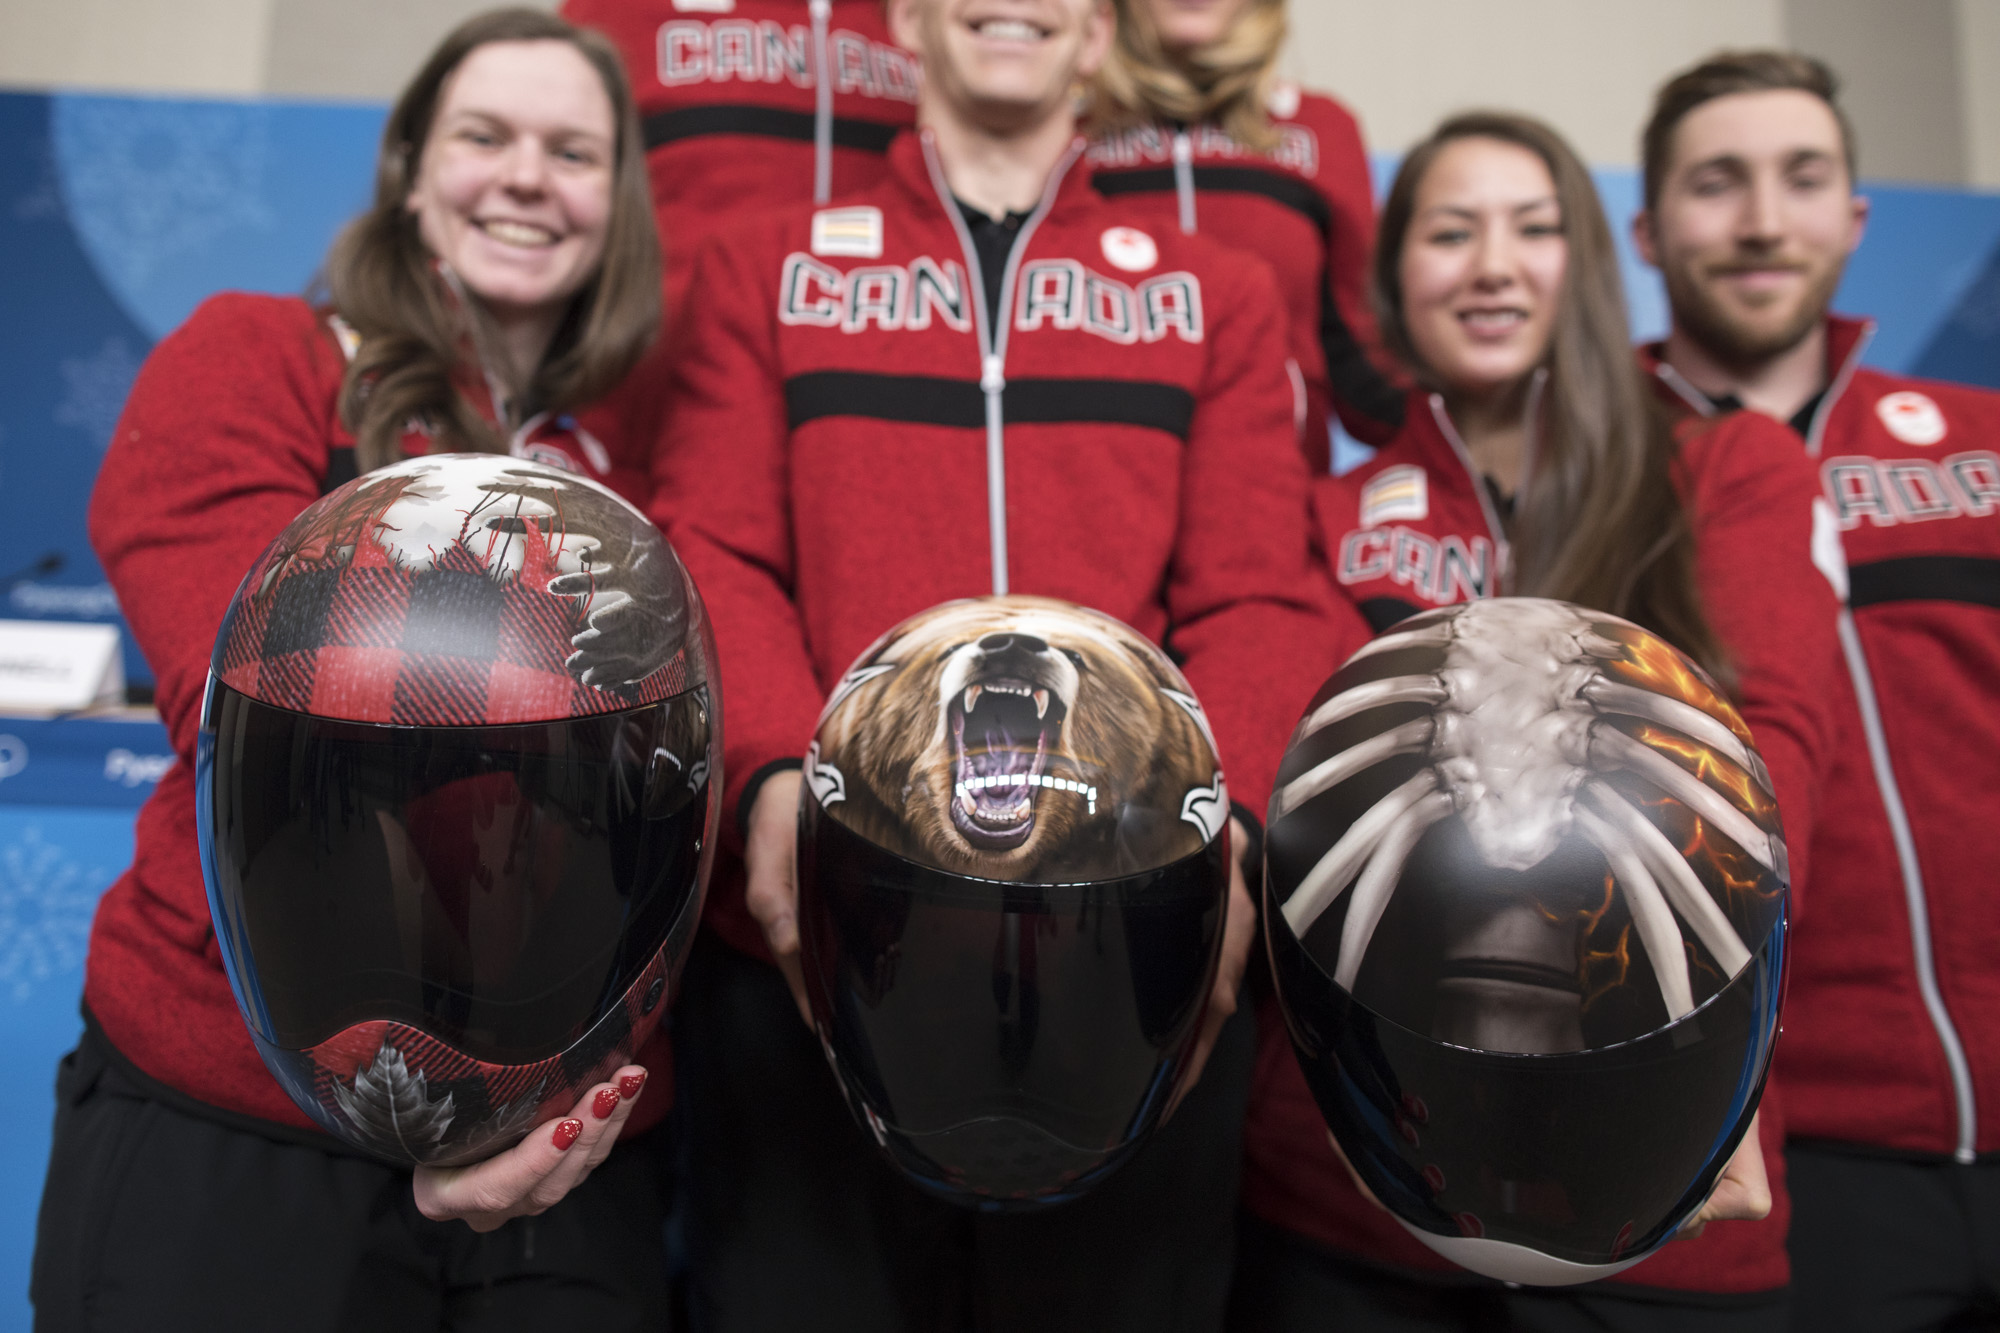 Team Canada PyeongChang 2018 Skeleton Helmets